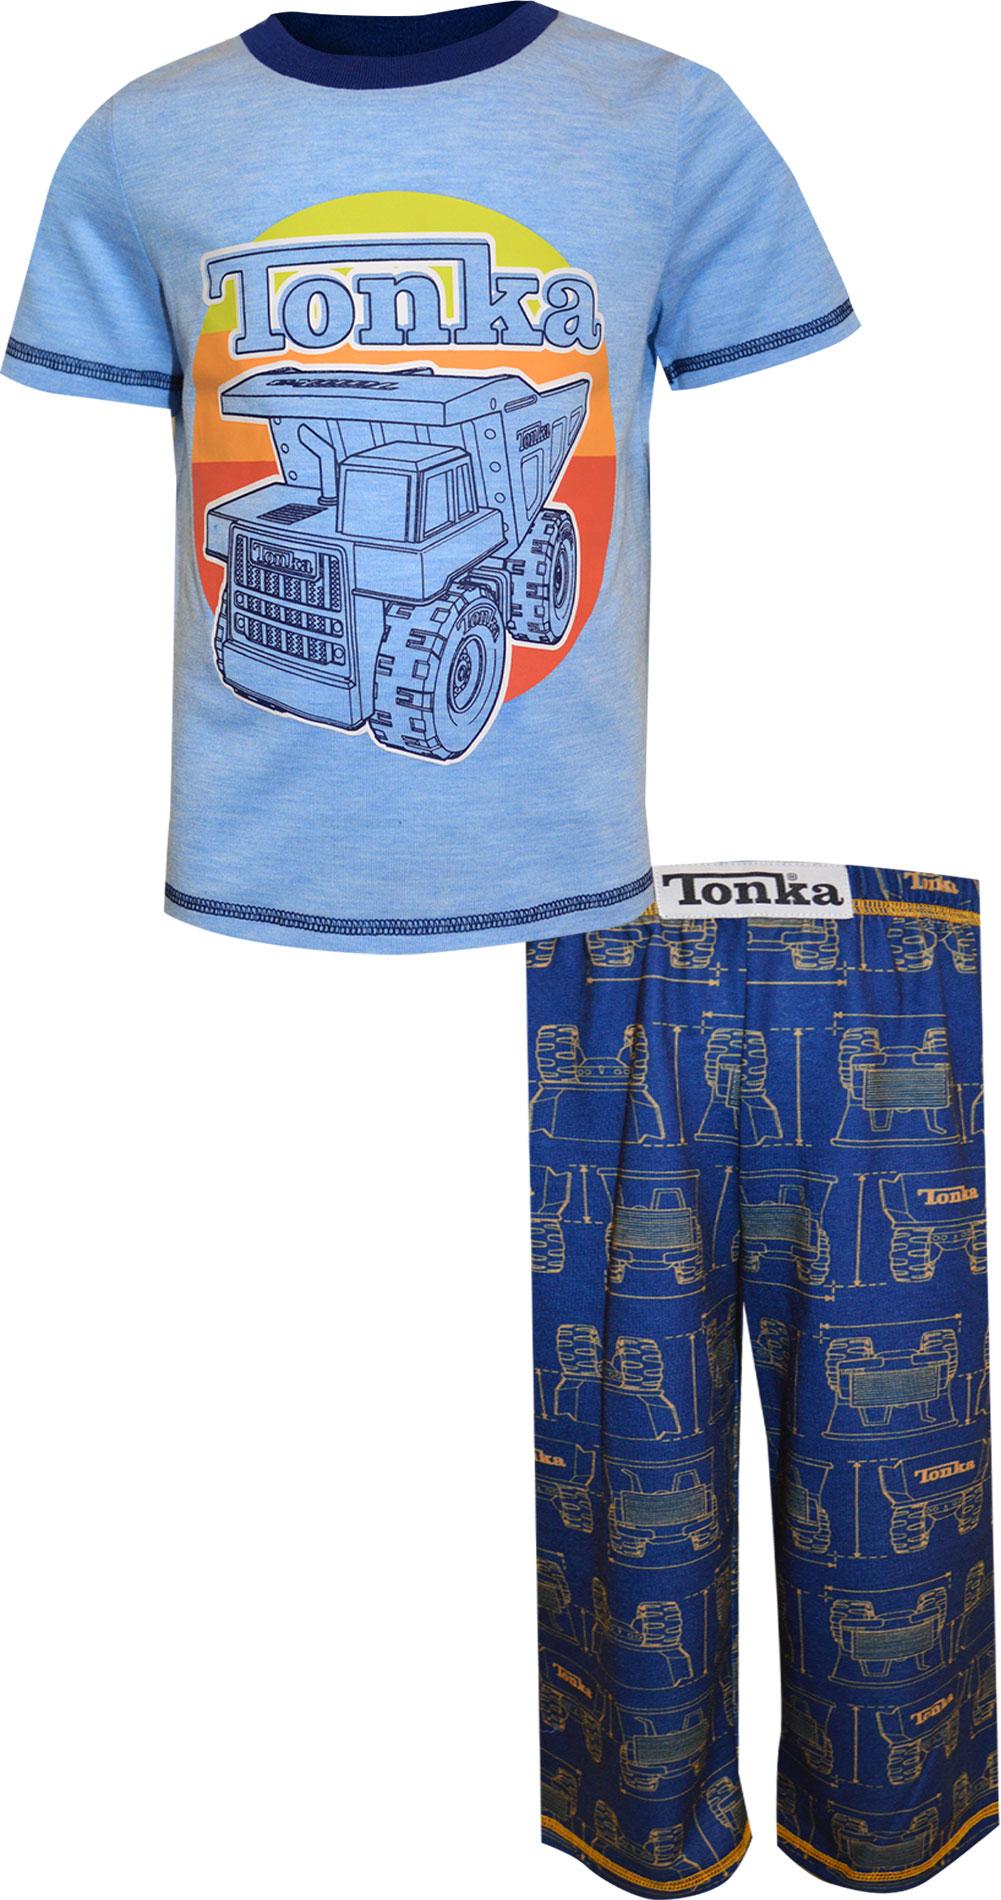 Image of Tonka Truck Real Tough Toddler Pajamas for boys